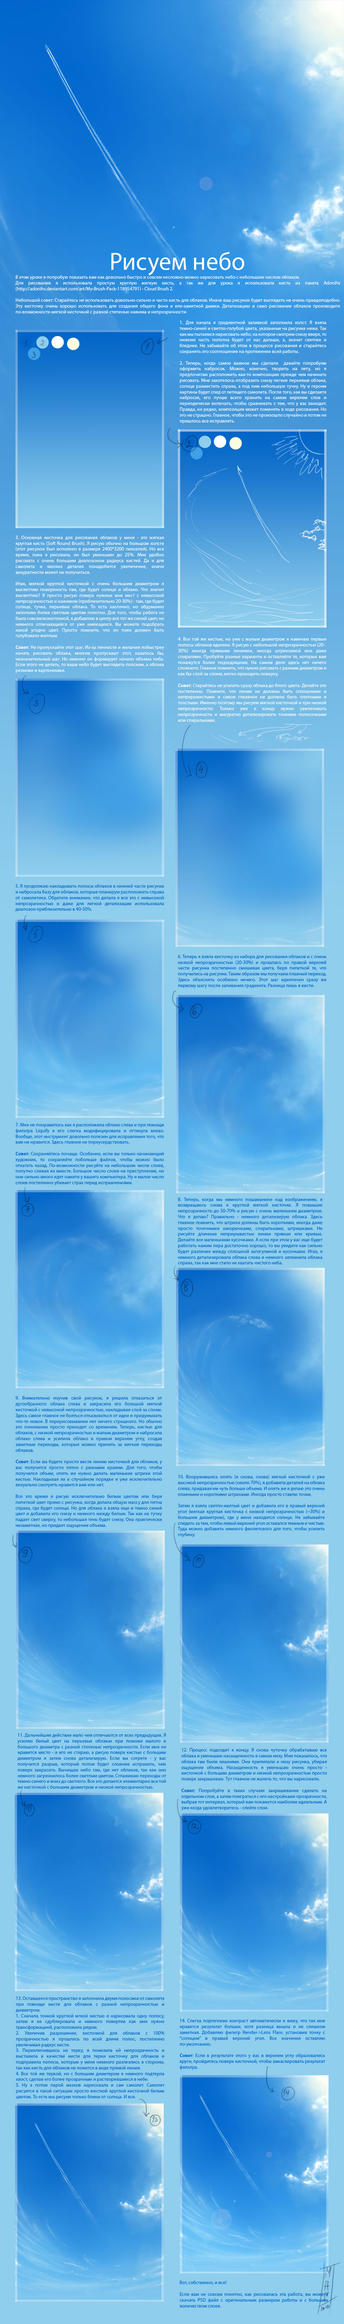 Sky Tutorial on Russian by SaisonRomantique